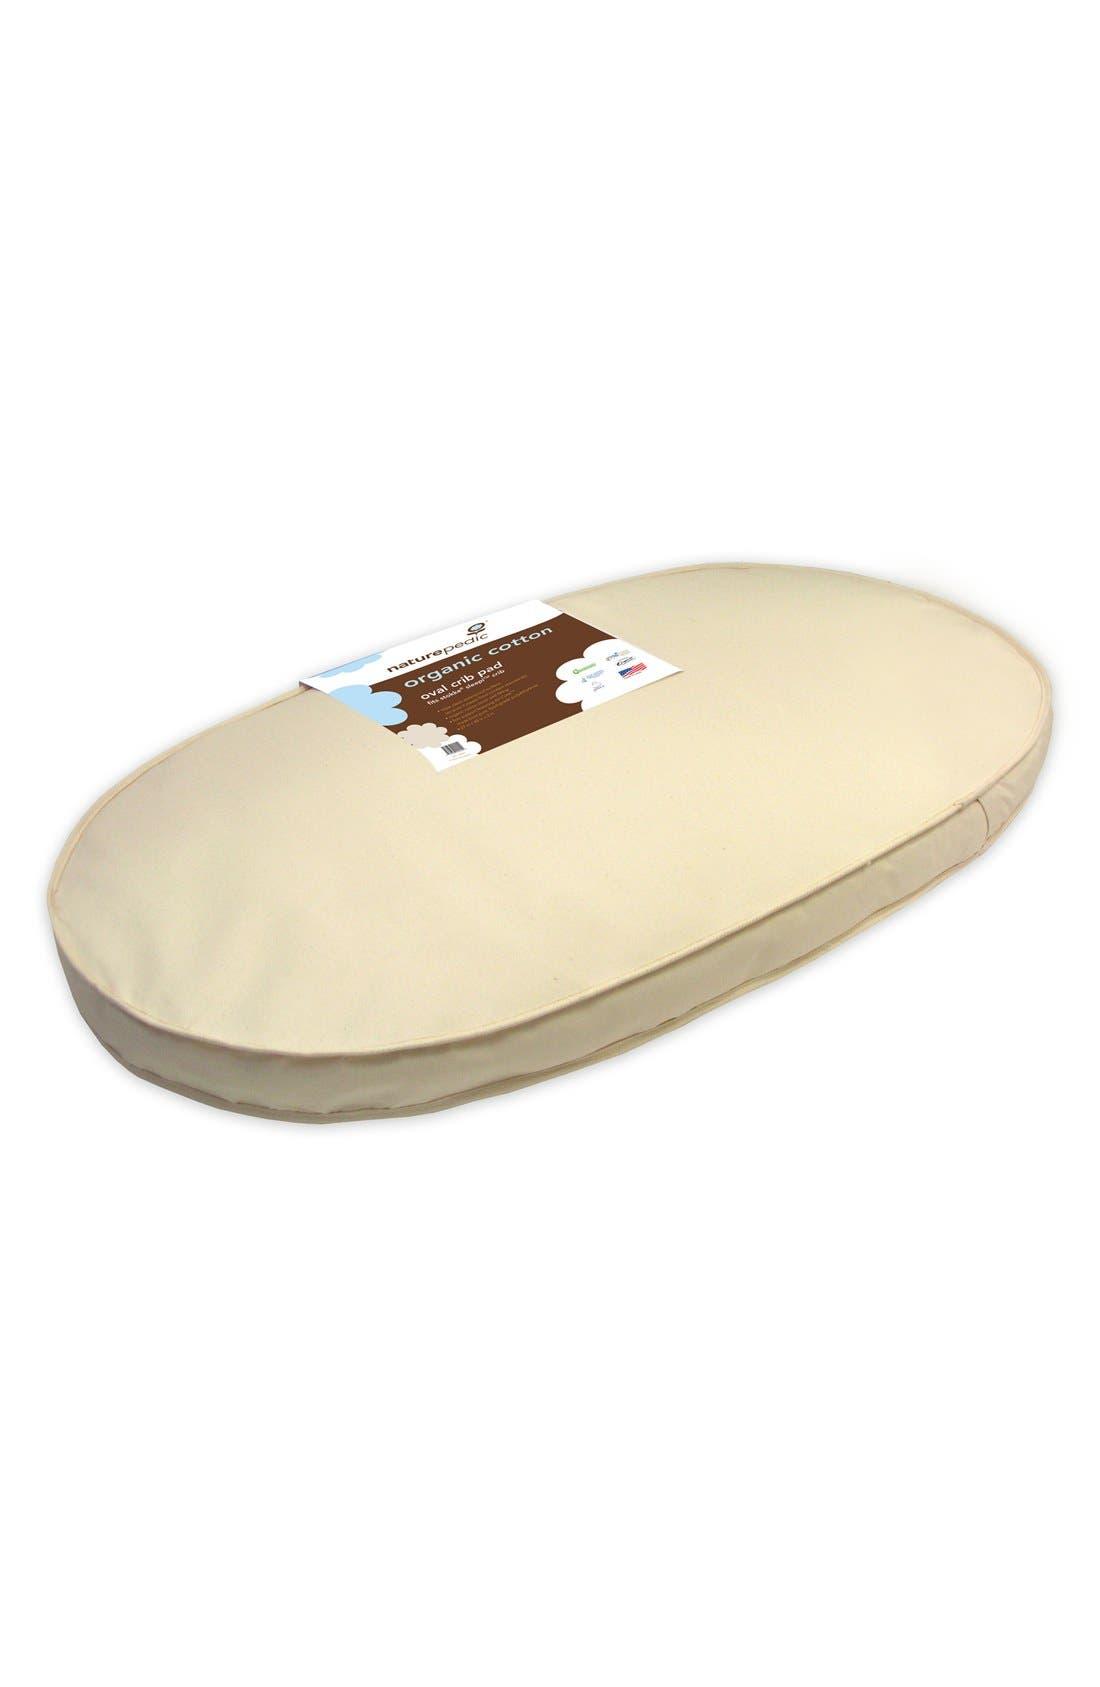 Naturepedic Organic Cotton Oval Crib Mattress for Stokke Sleepi Crib